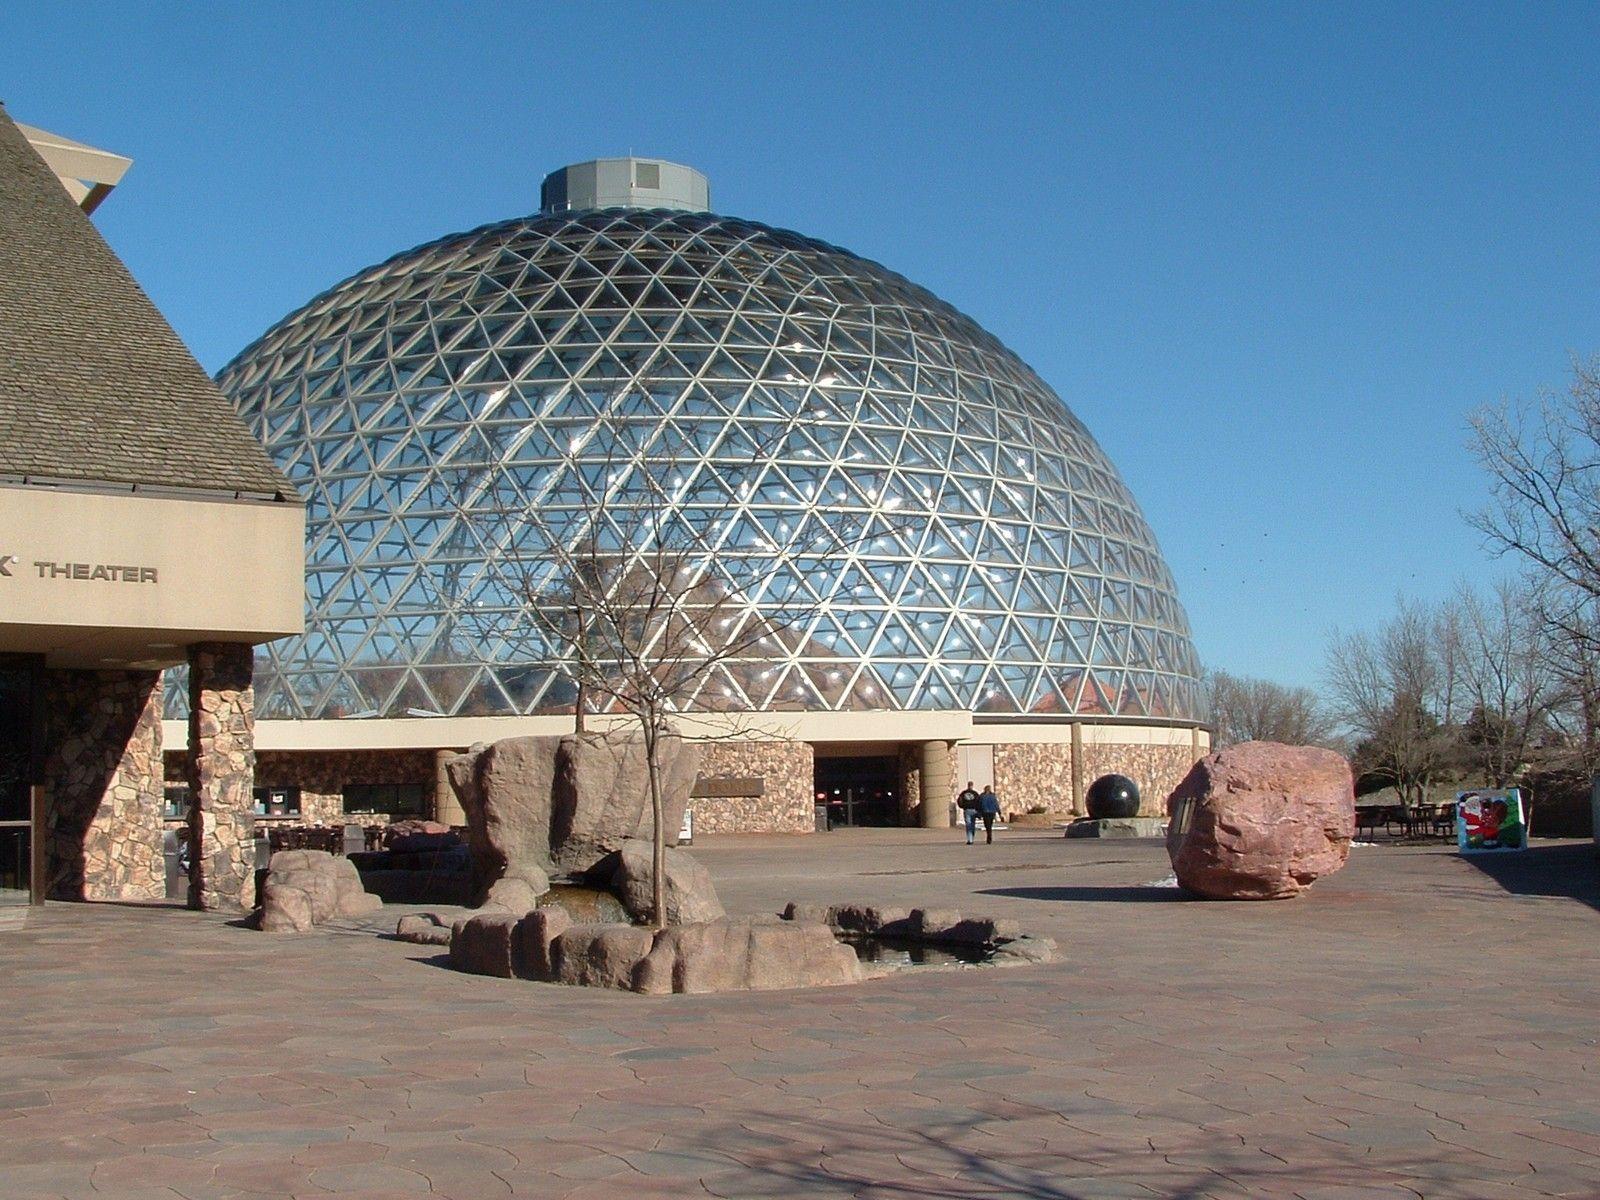 Henry Doorly Zoo Omaha NE & Henry Doorly Zoo Omaha NE | Omaha Nebraska | Pinterest | Visit ... pezcame.com